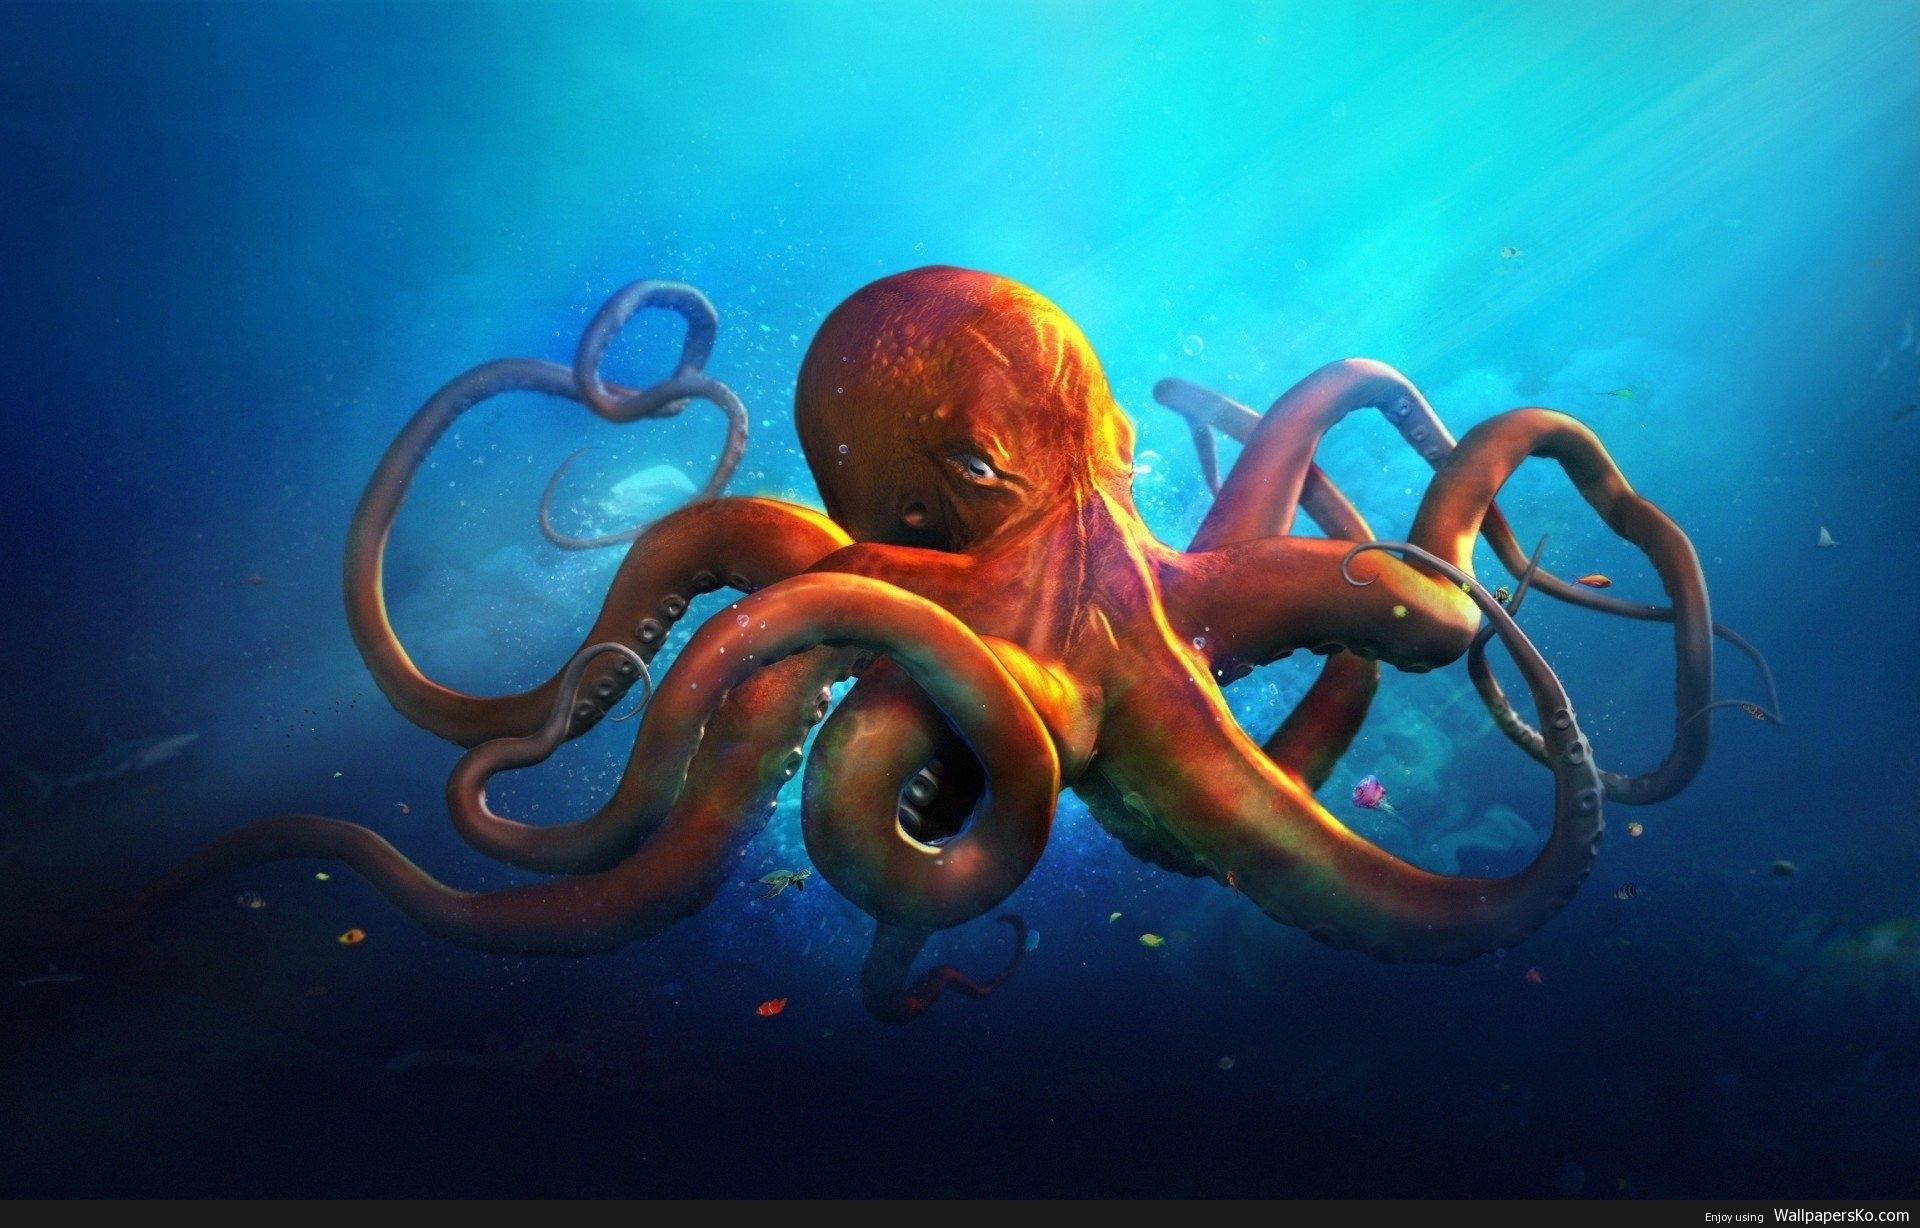 hd octopus wallpaper | hd wallpapers download